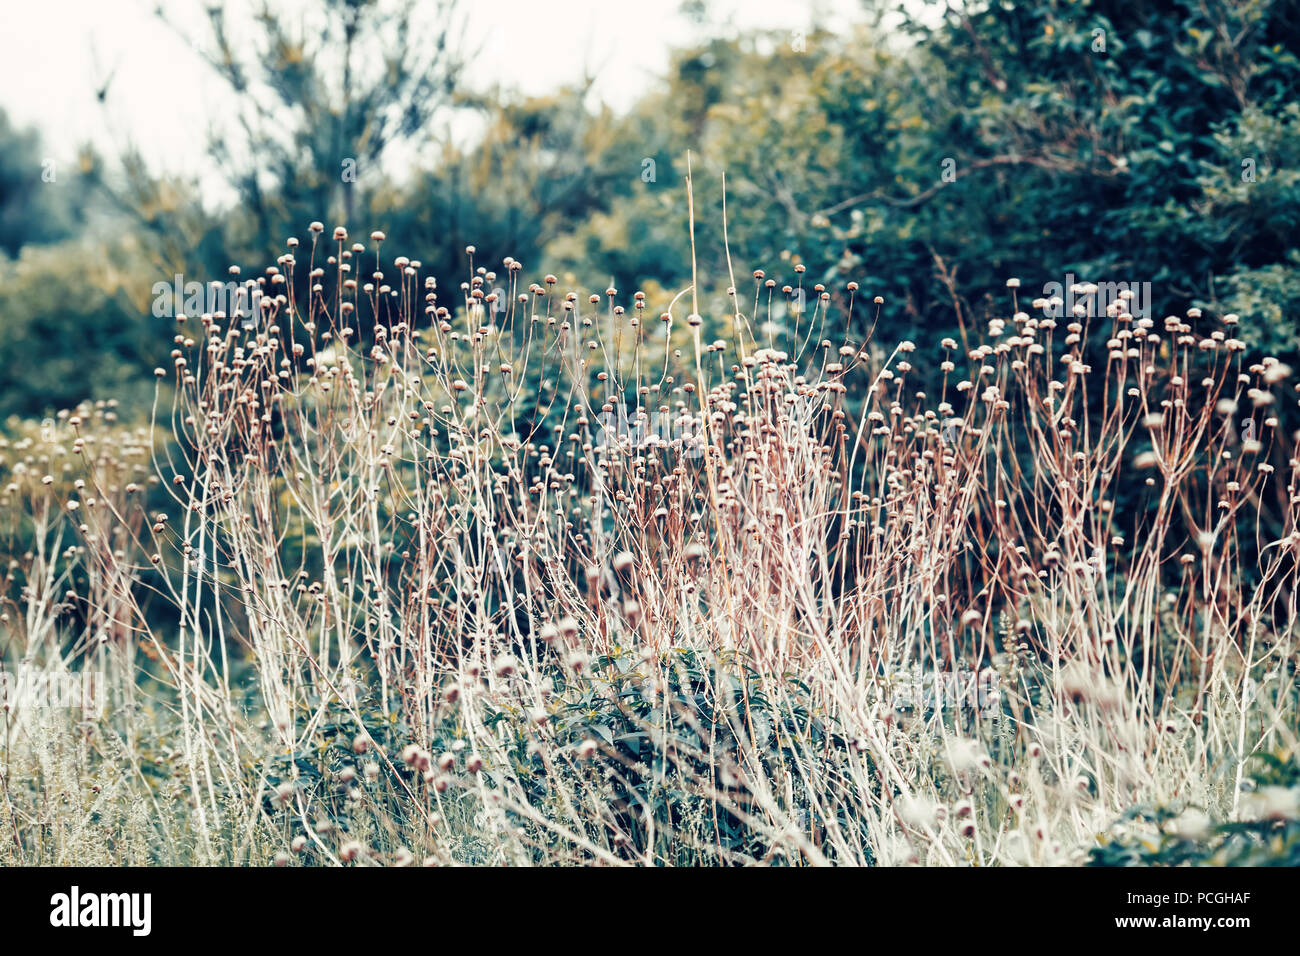 Beautiful fairy dreamy magic wild field flowers, grass and